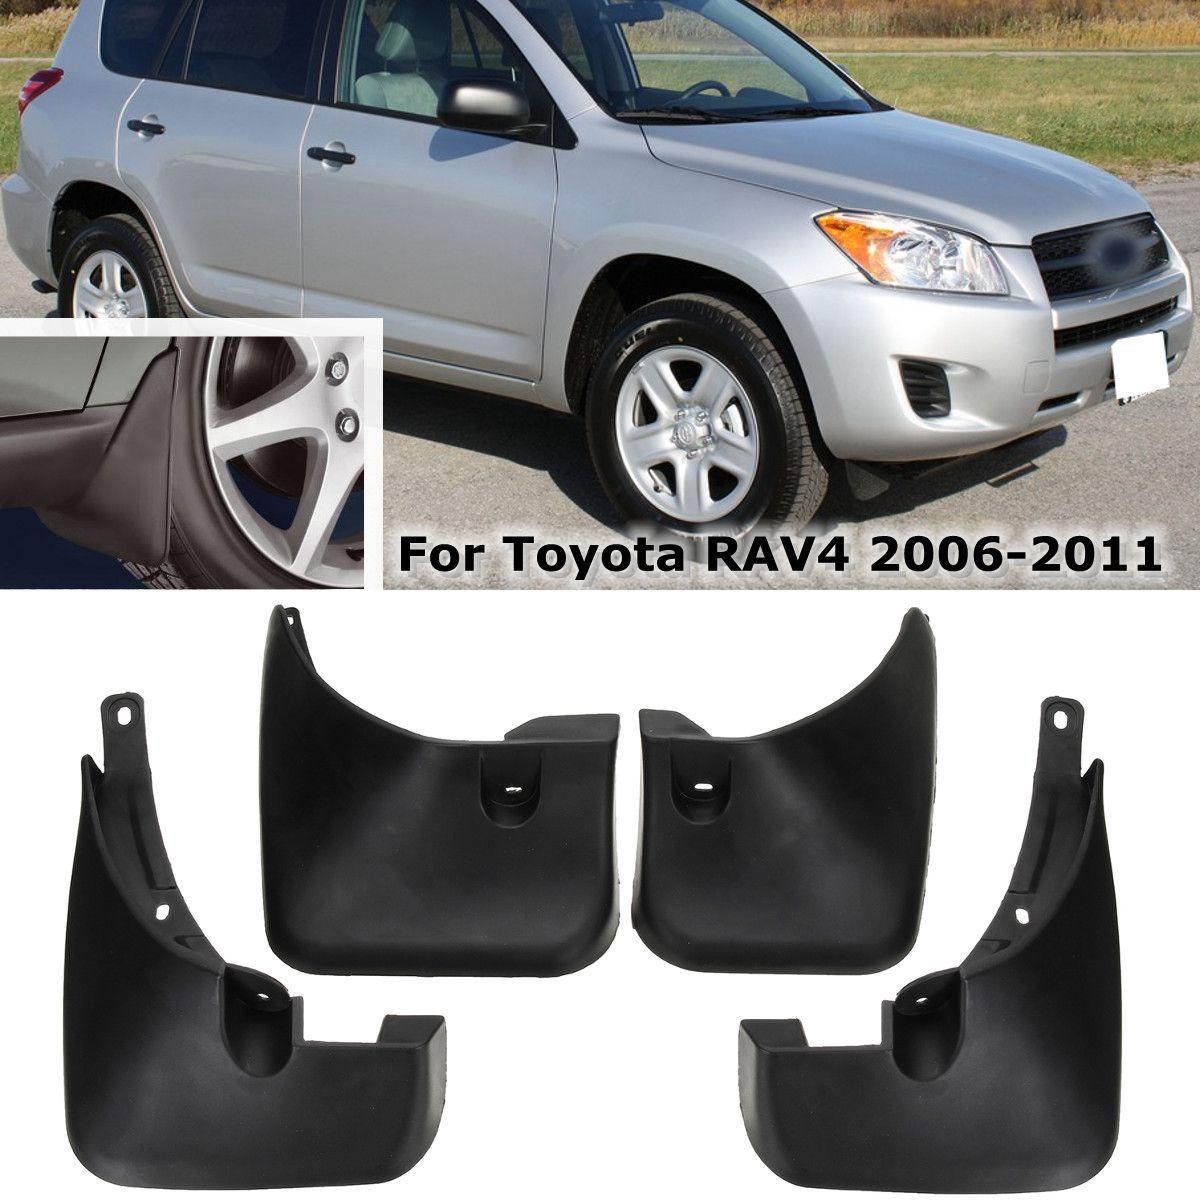 Car Mud Flaps Splash Guards Mudguards Fender Mudflaps Accessories For Toyota RAV4 2006 2007 2008 2009 2010 2011 2012